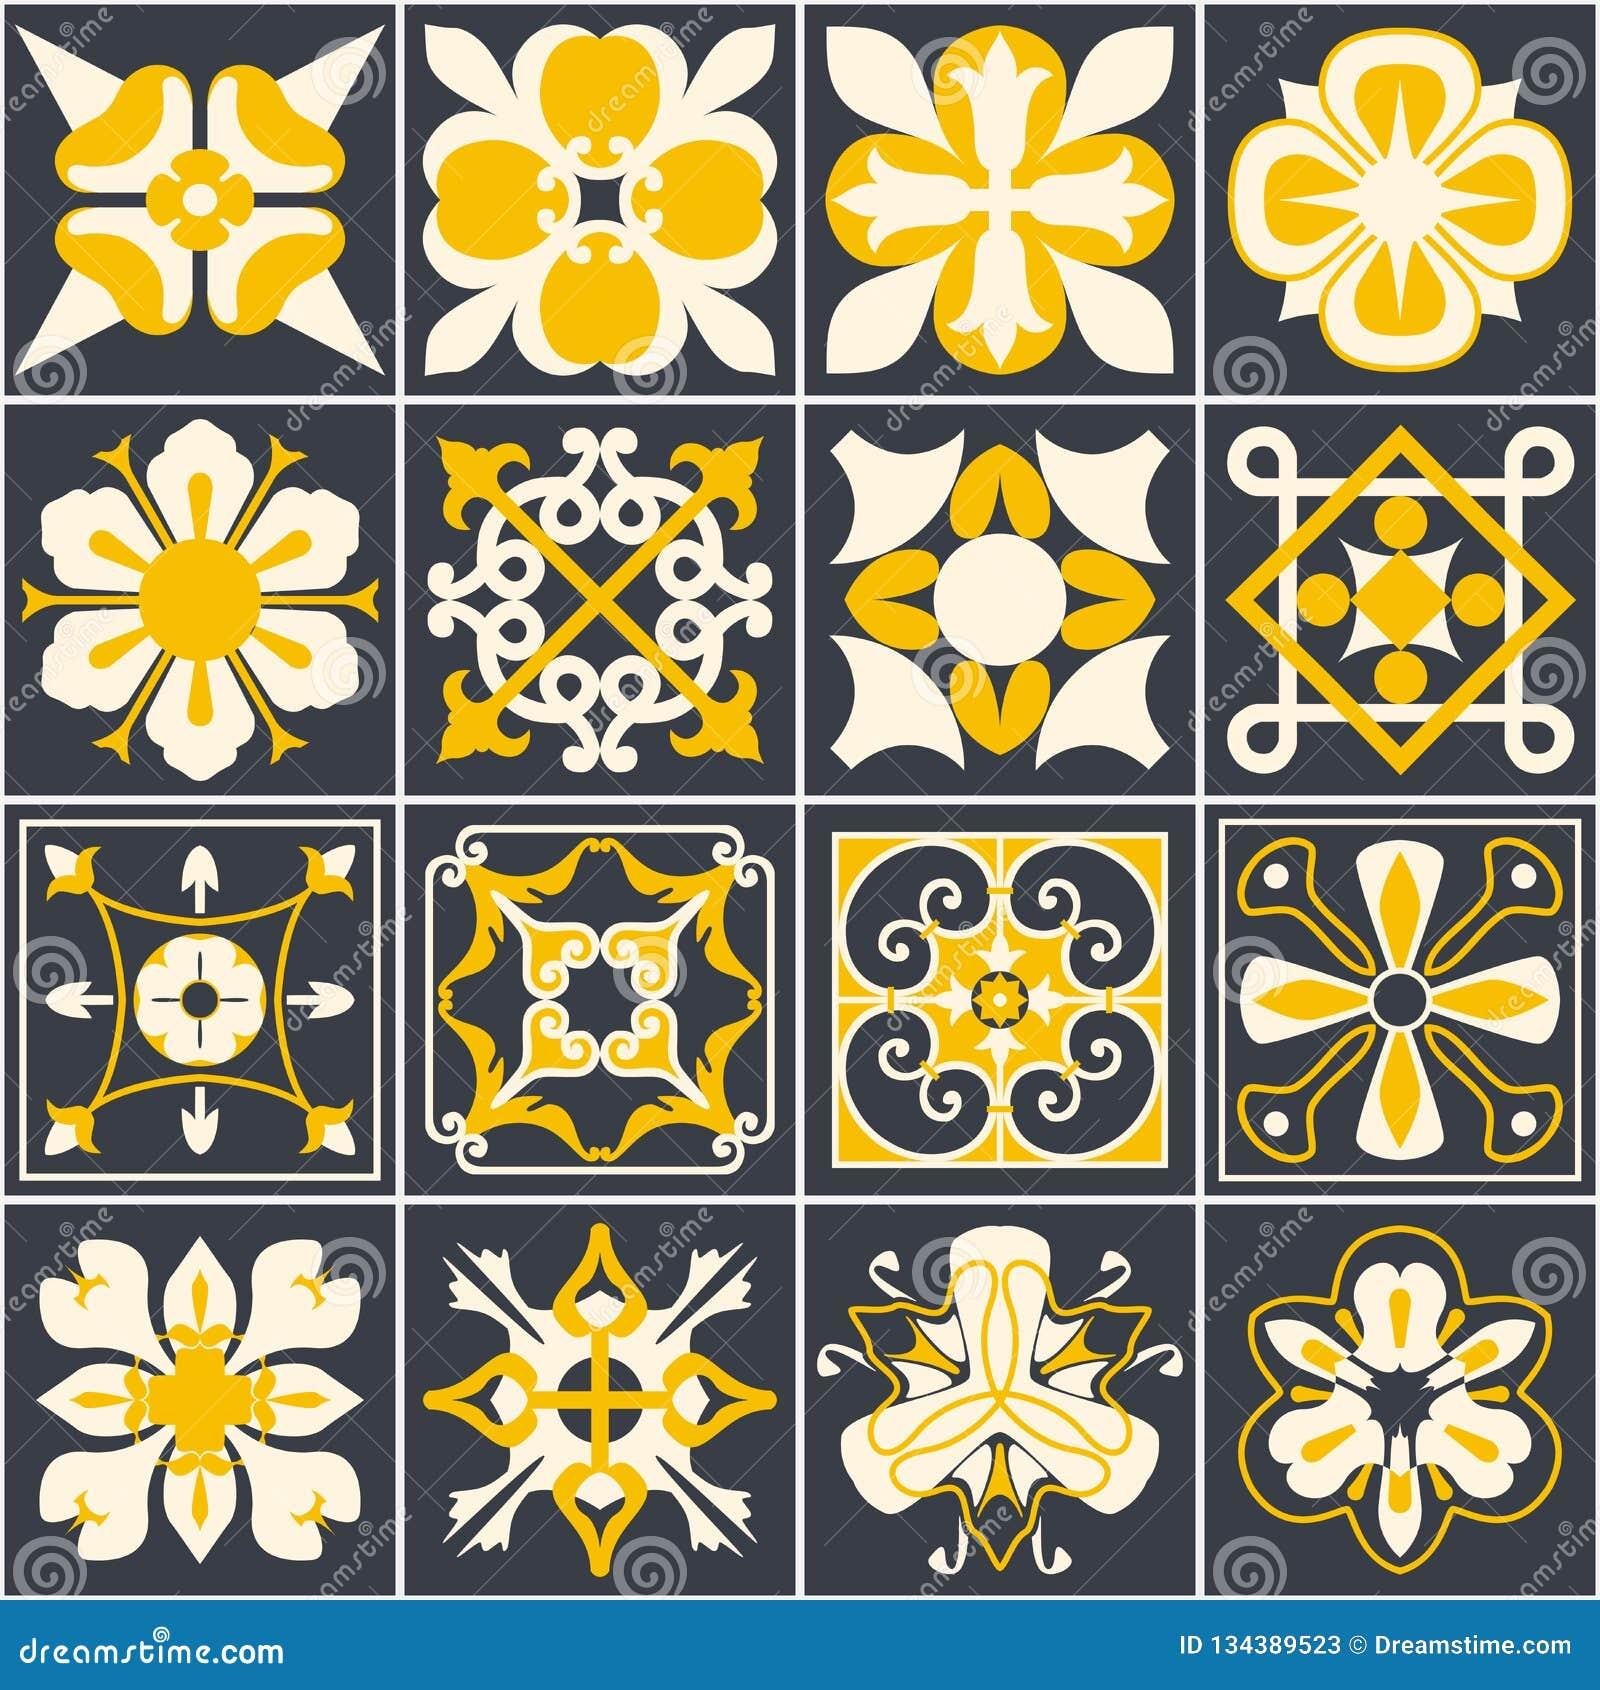 Portuguese tiles. background. Mediterranean style. Multicolor design.